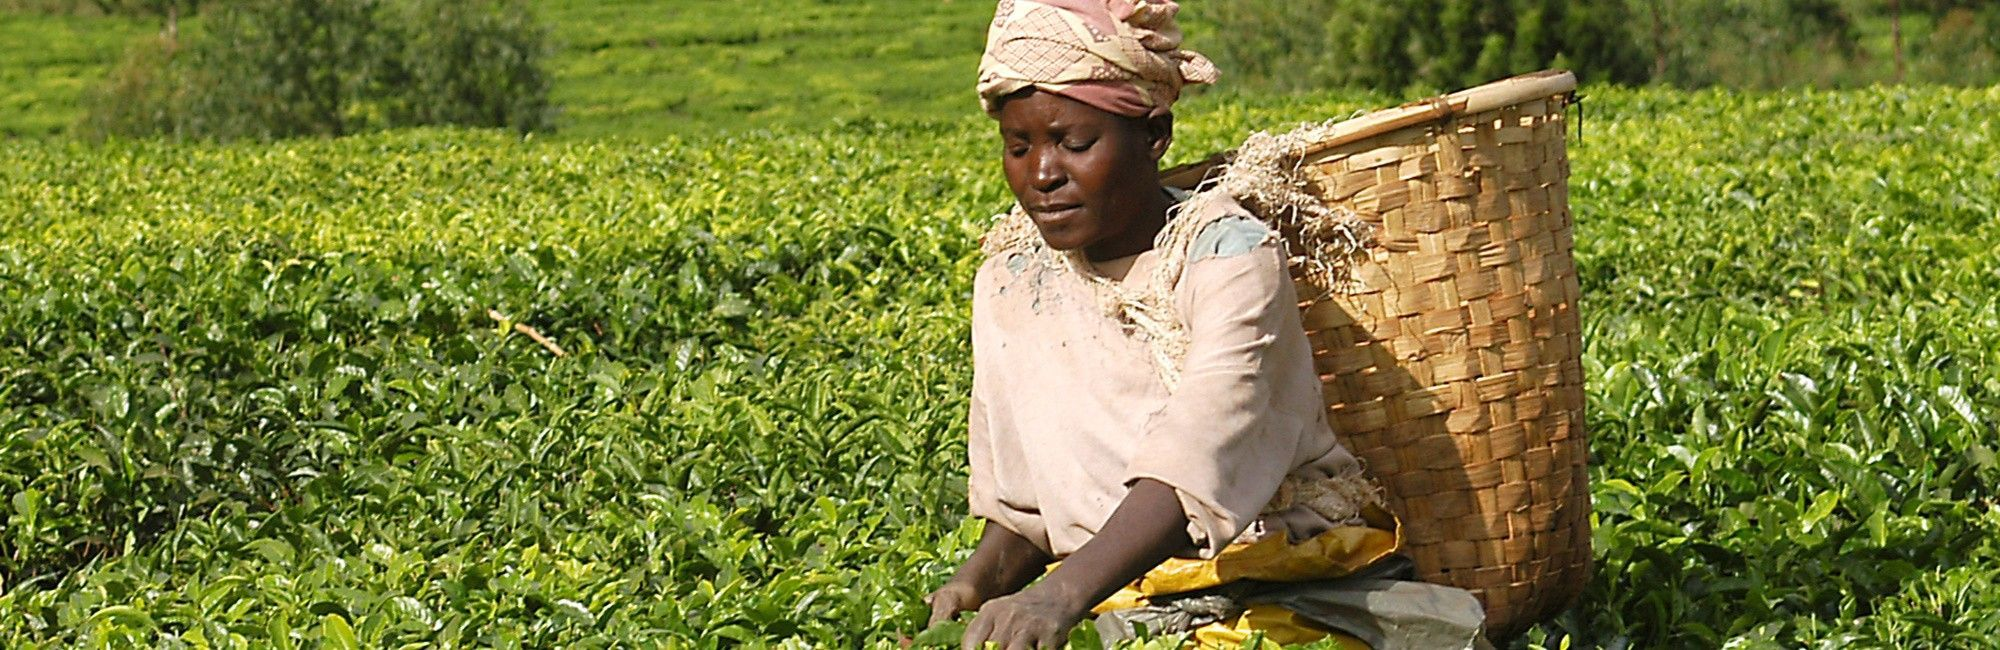 Malawi Theeplantage